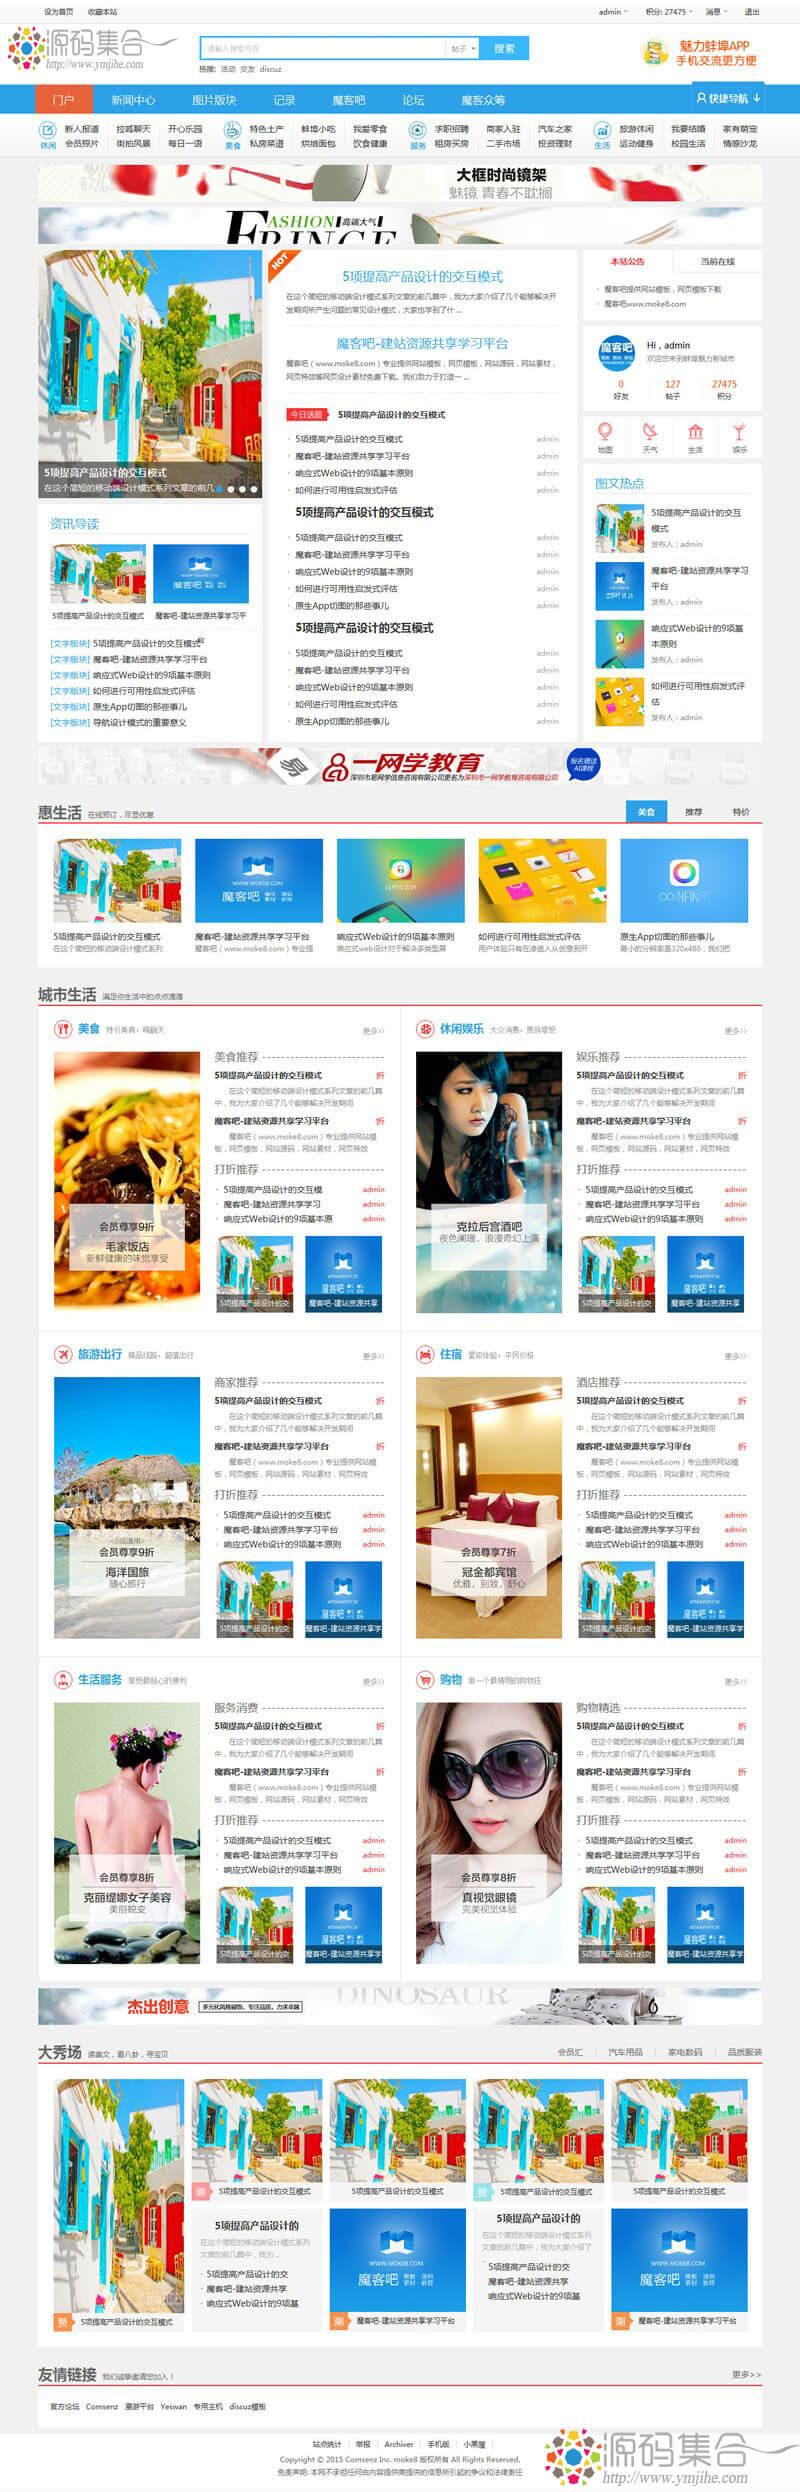 discuz!清新地方门户网站模板分享